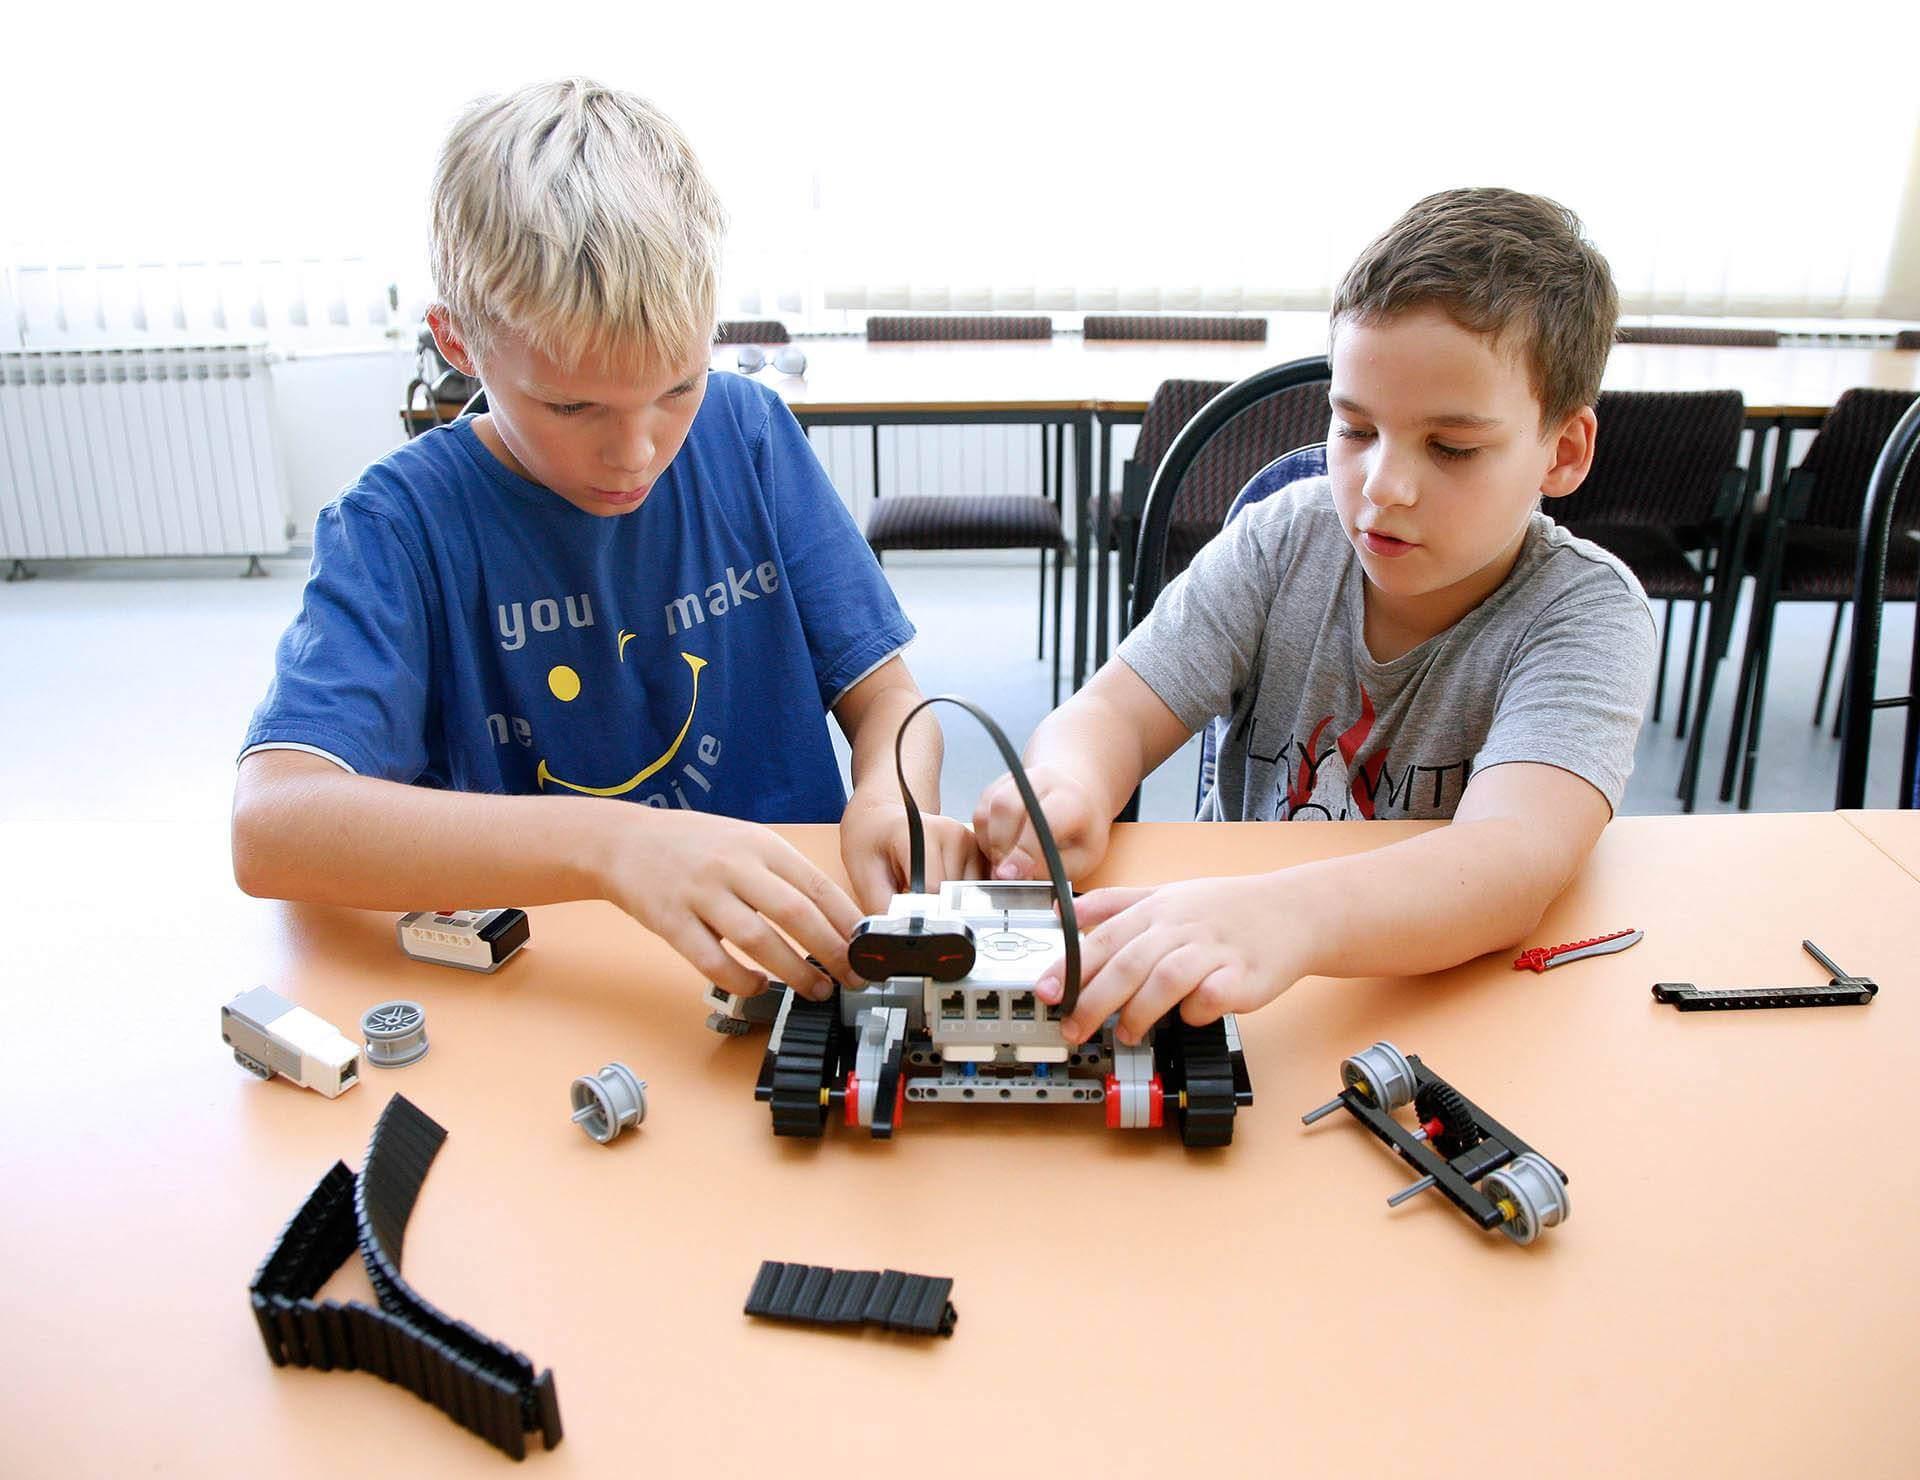 roboti-0008-robotika-djeca10-1709151920x1480-113